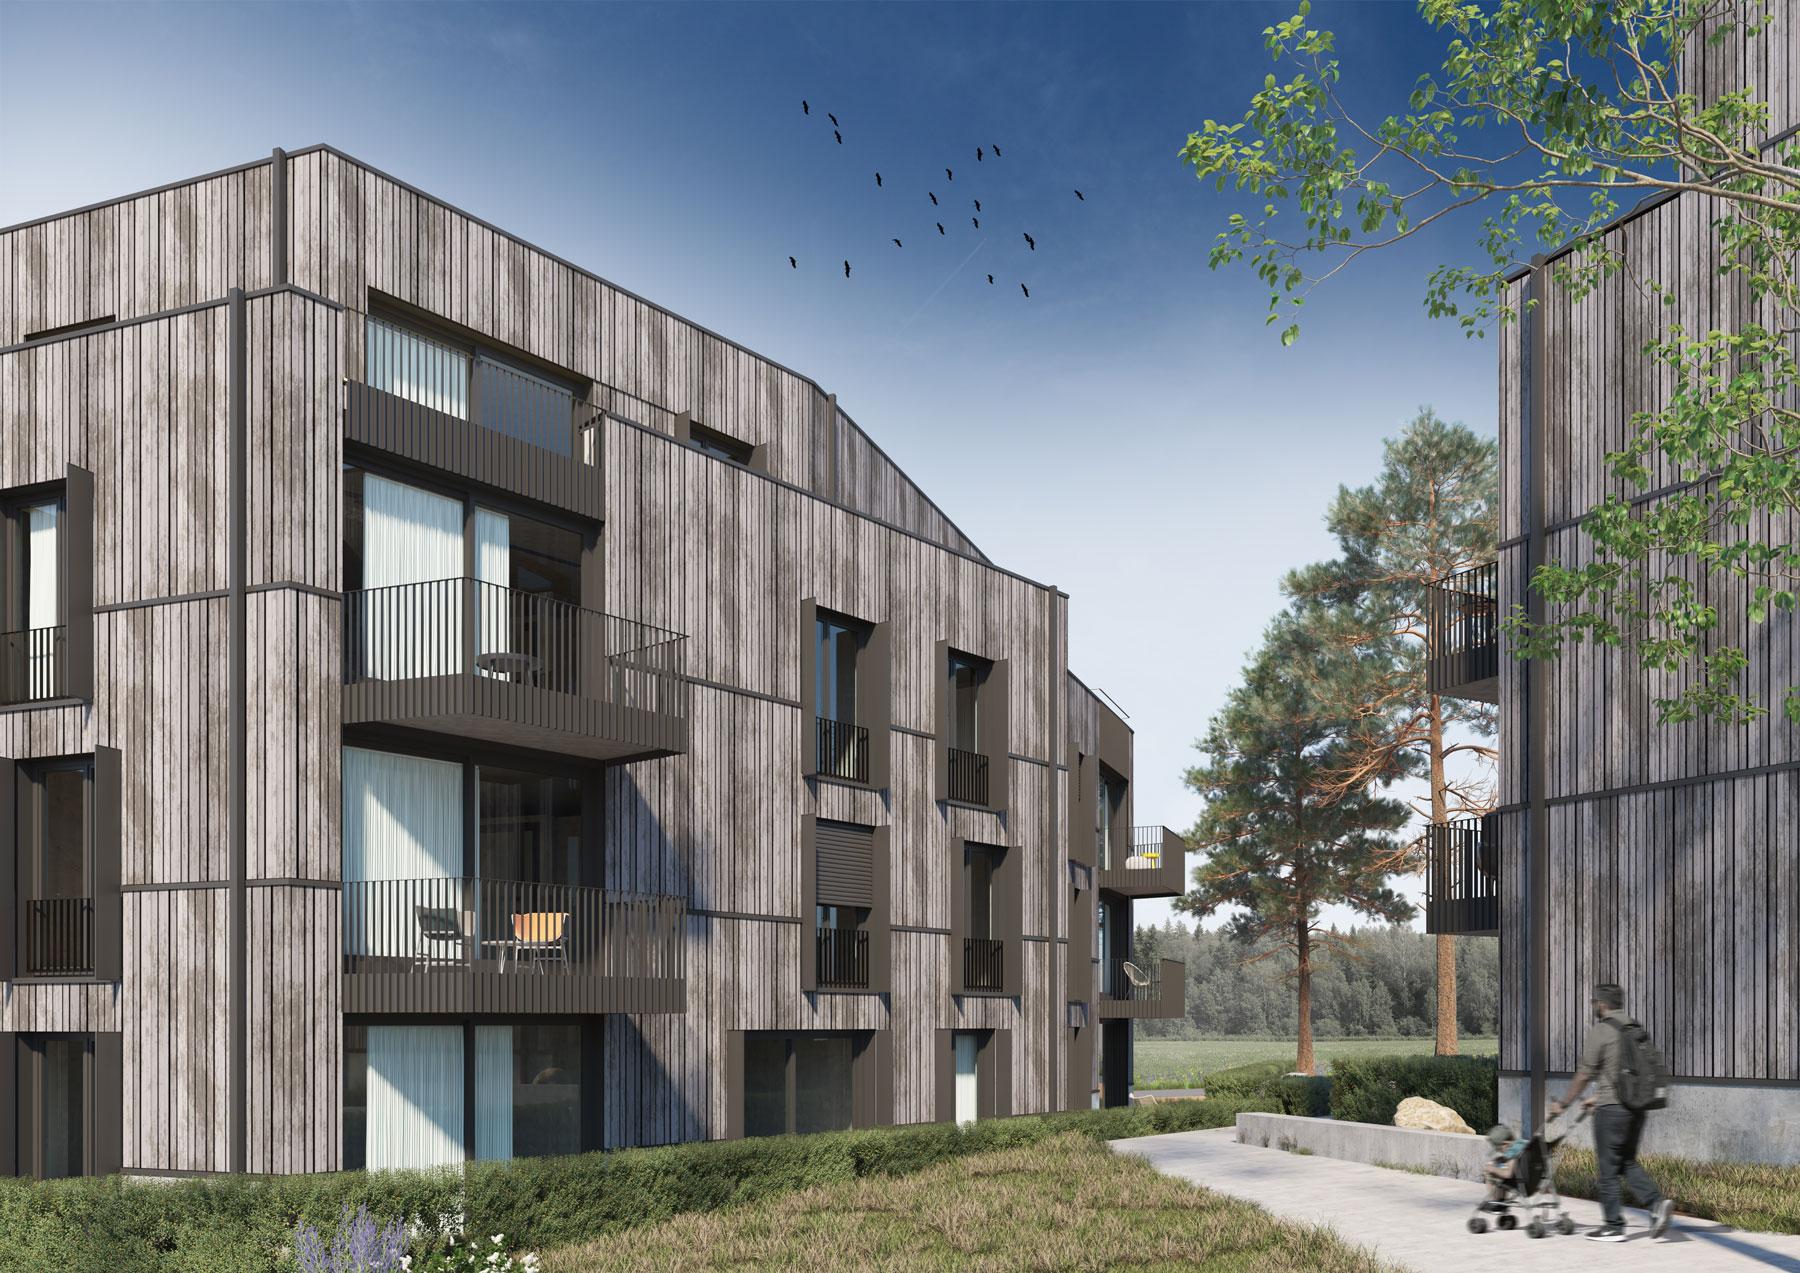 3dkad-3D-Visualisierung-Holzbau-Wohnungsbau-Calw-Mehrfamilienhaus